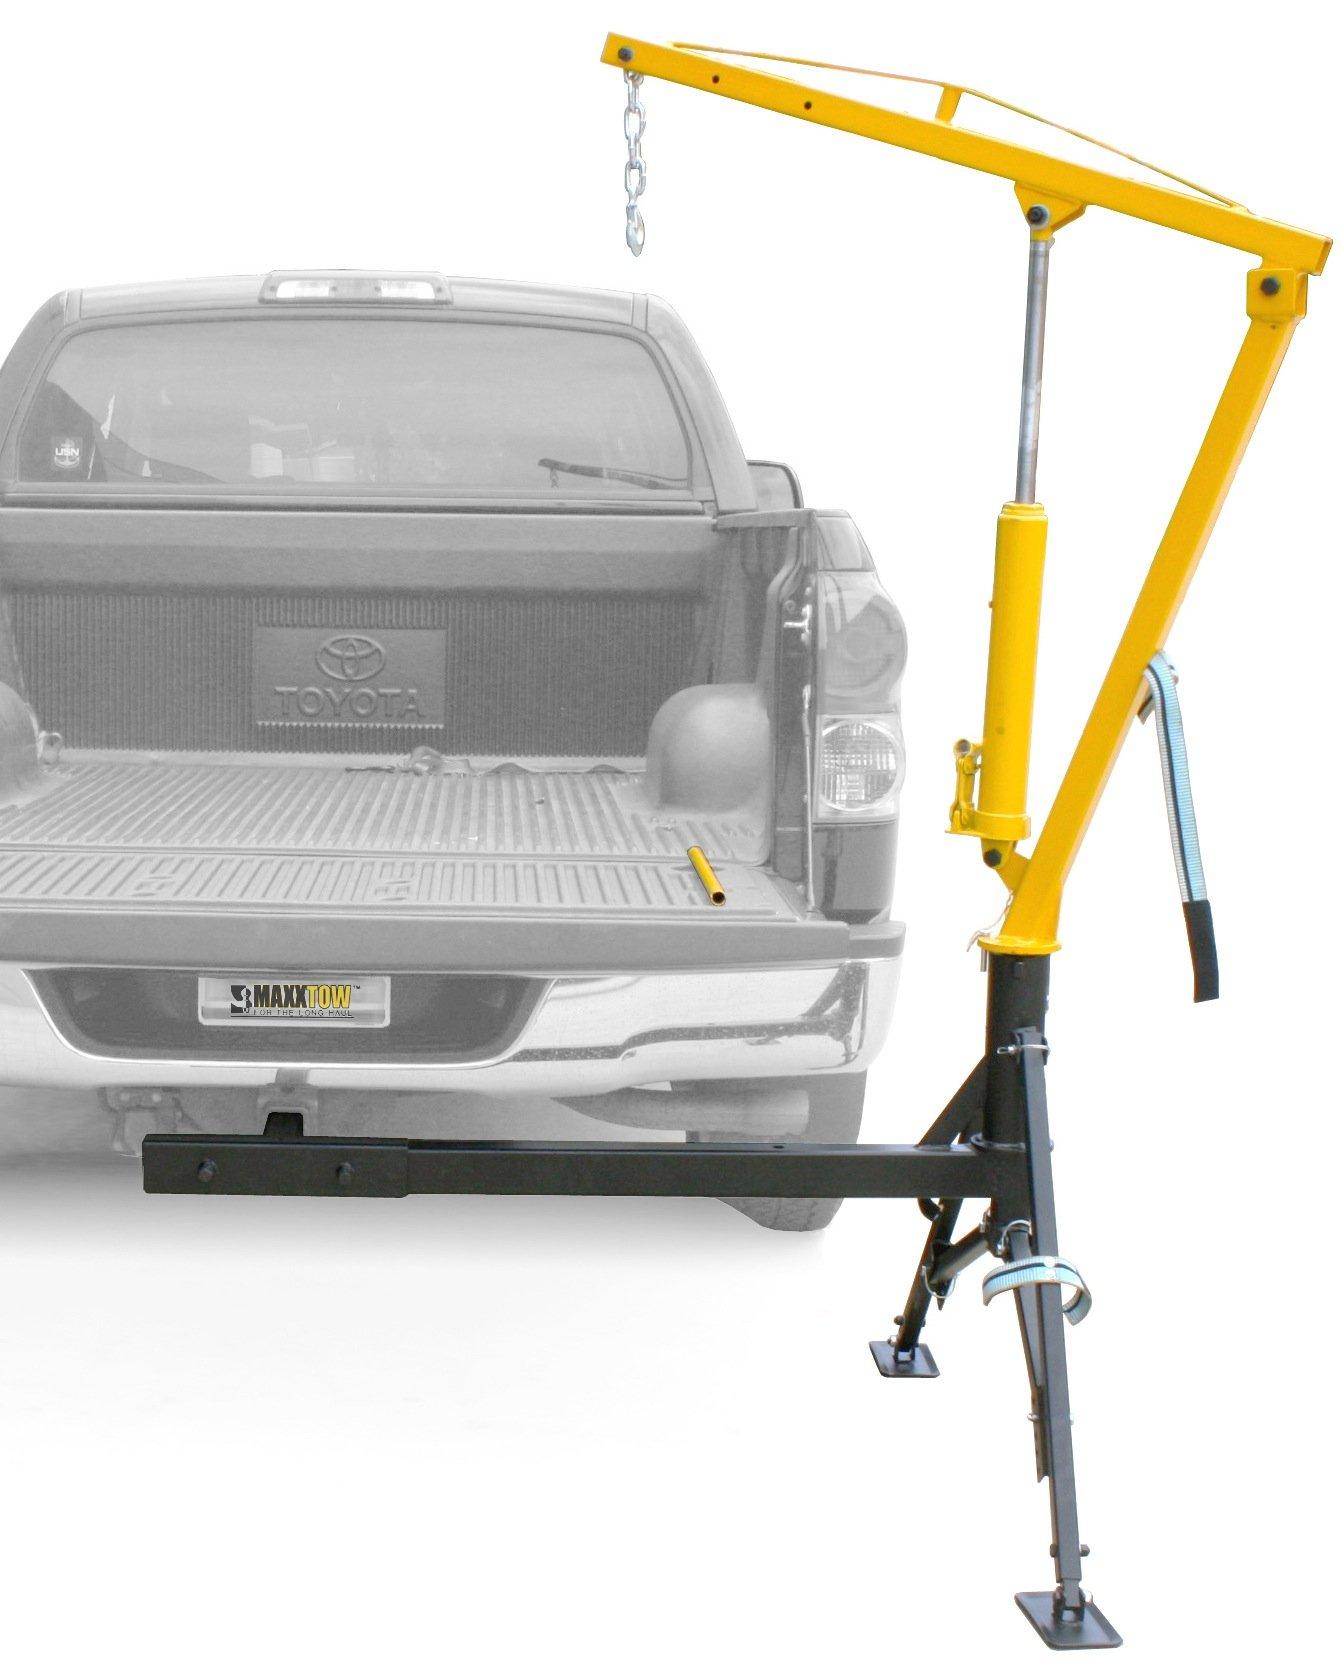 MaxxHaul 70238 Receiver Hitch Mounted Crane - 1000 lbs. Capacity by MaxxHaul